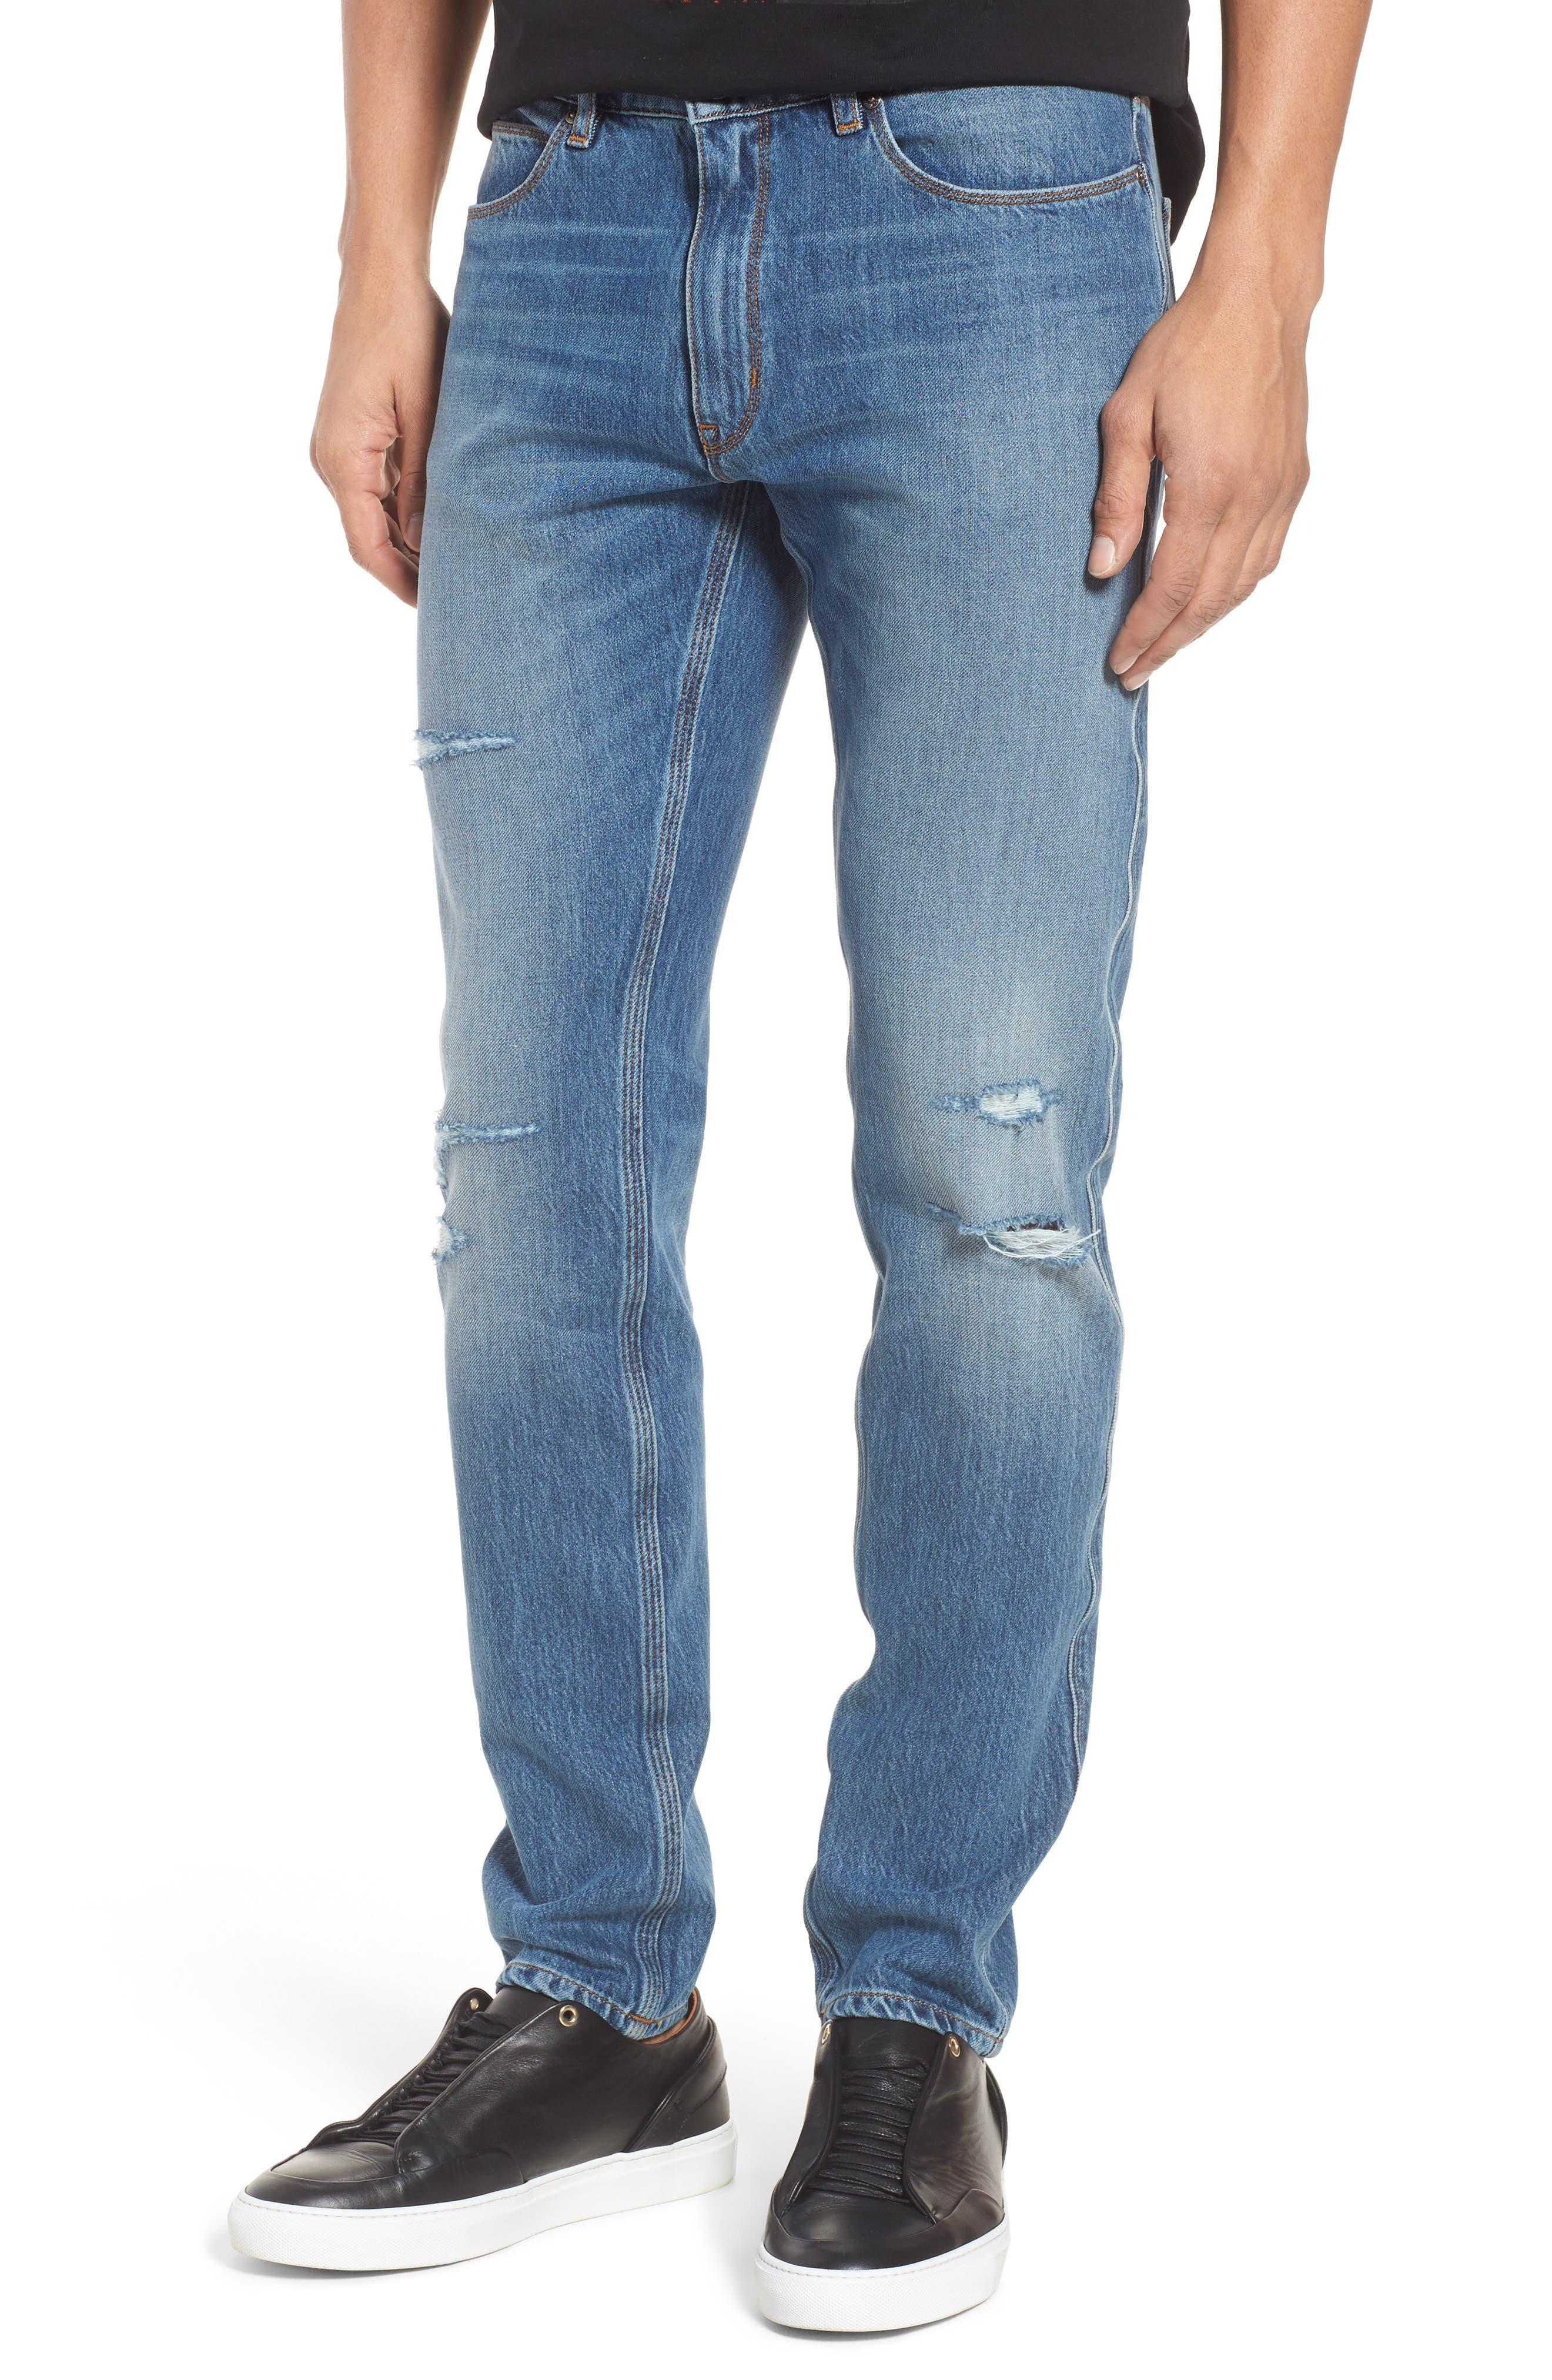 Hugo Boss 734 Distressed Skinny Fit Jeans